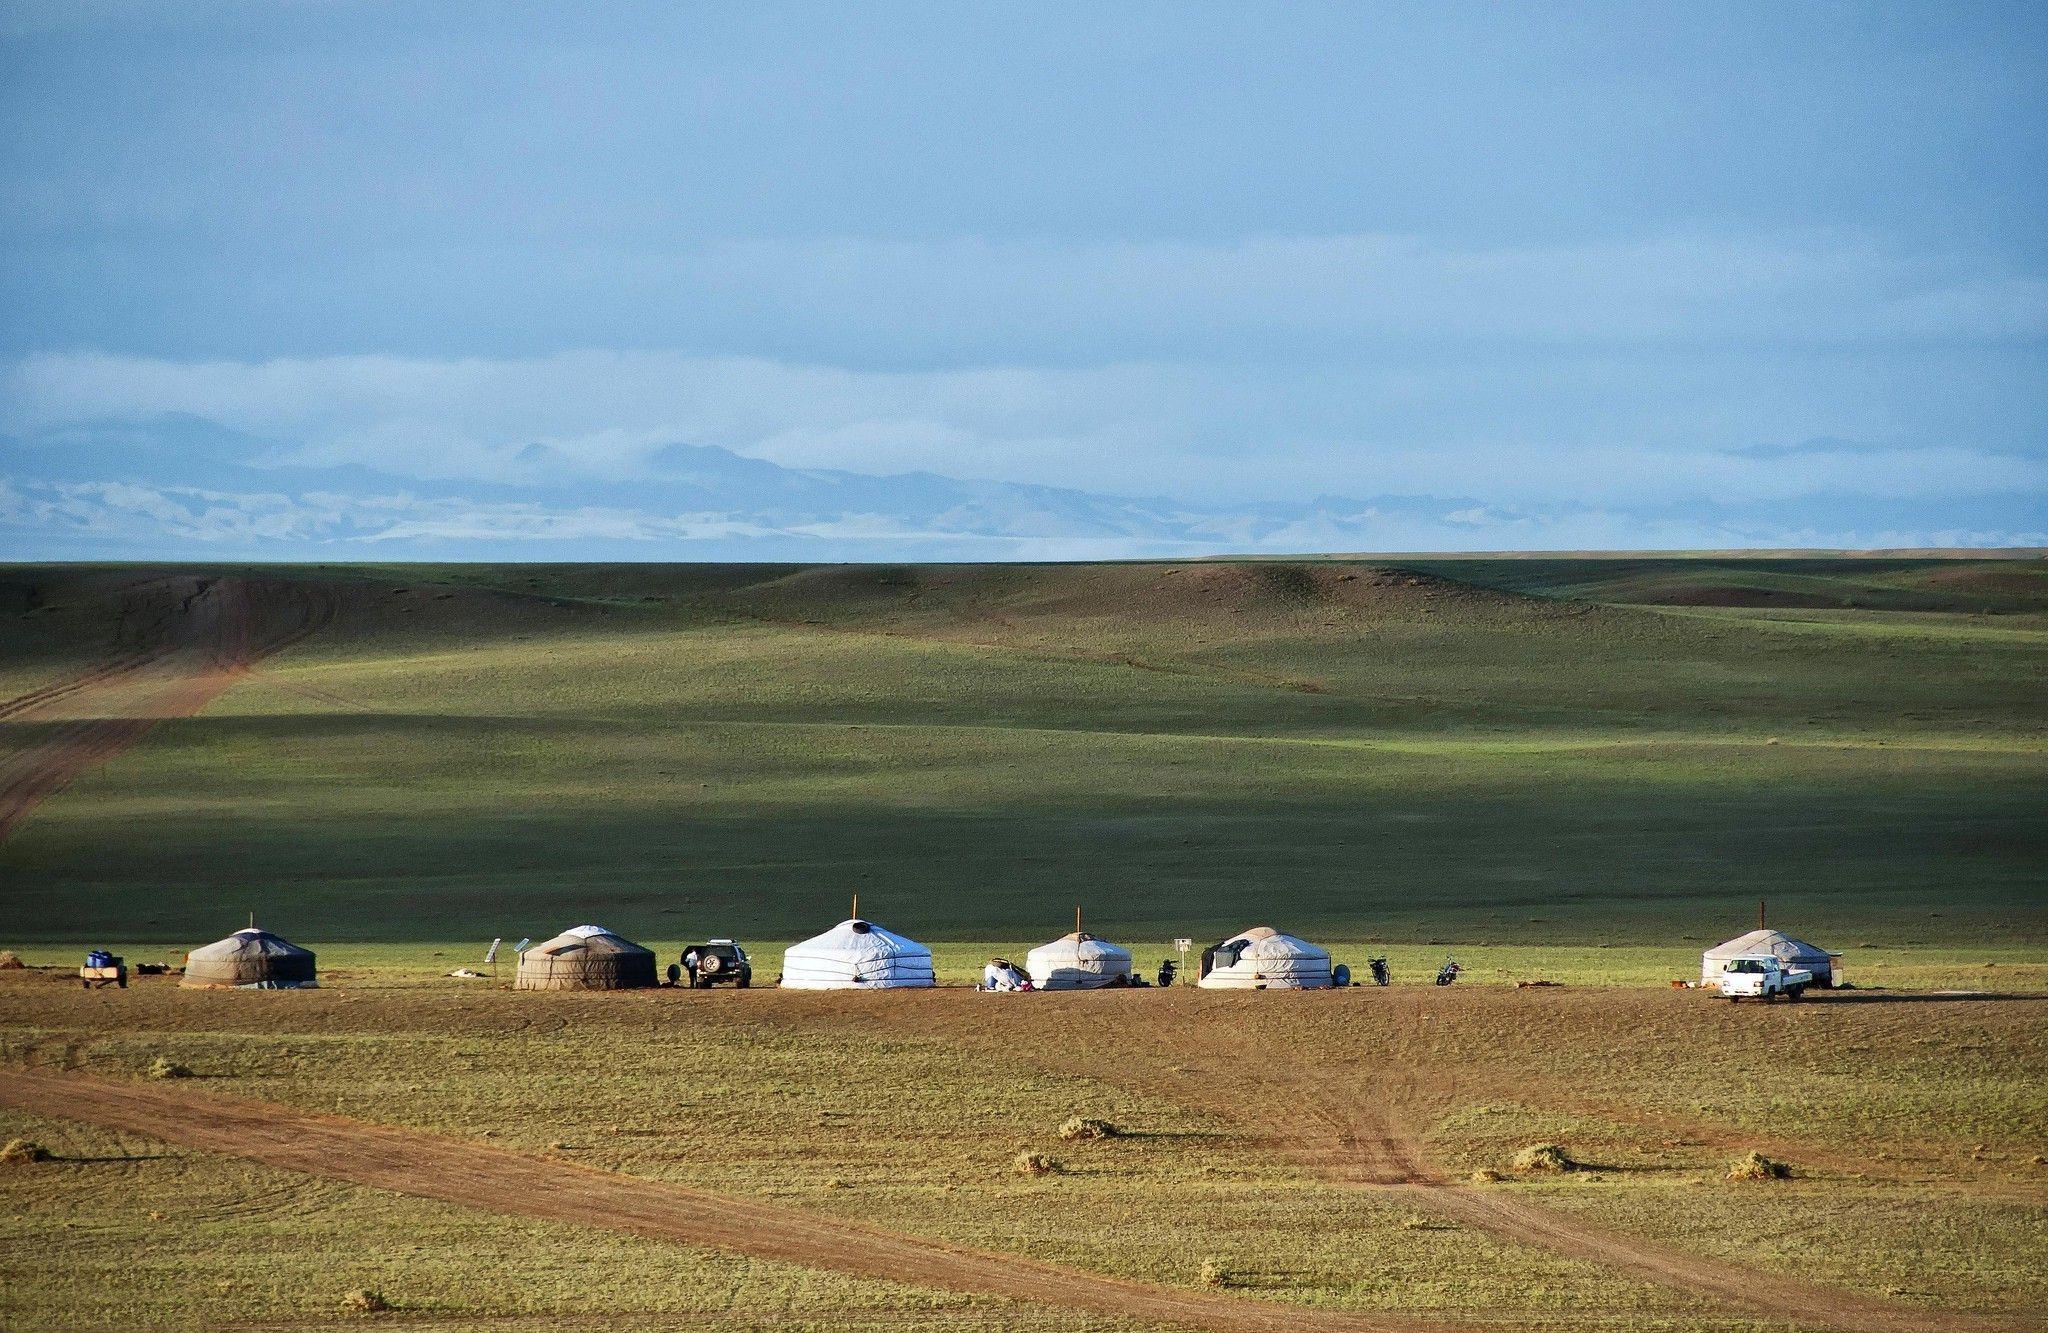 Mongolia Desktop Wallpapers Top Free Mongolia Desktop